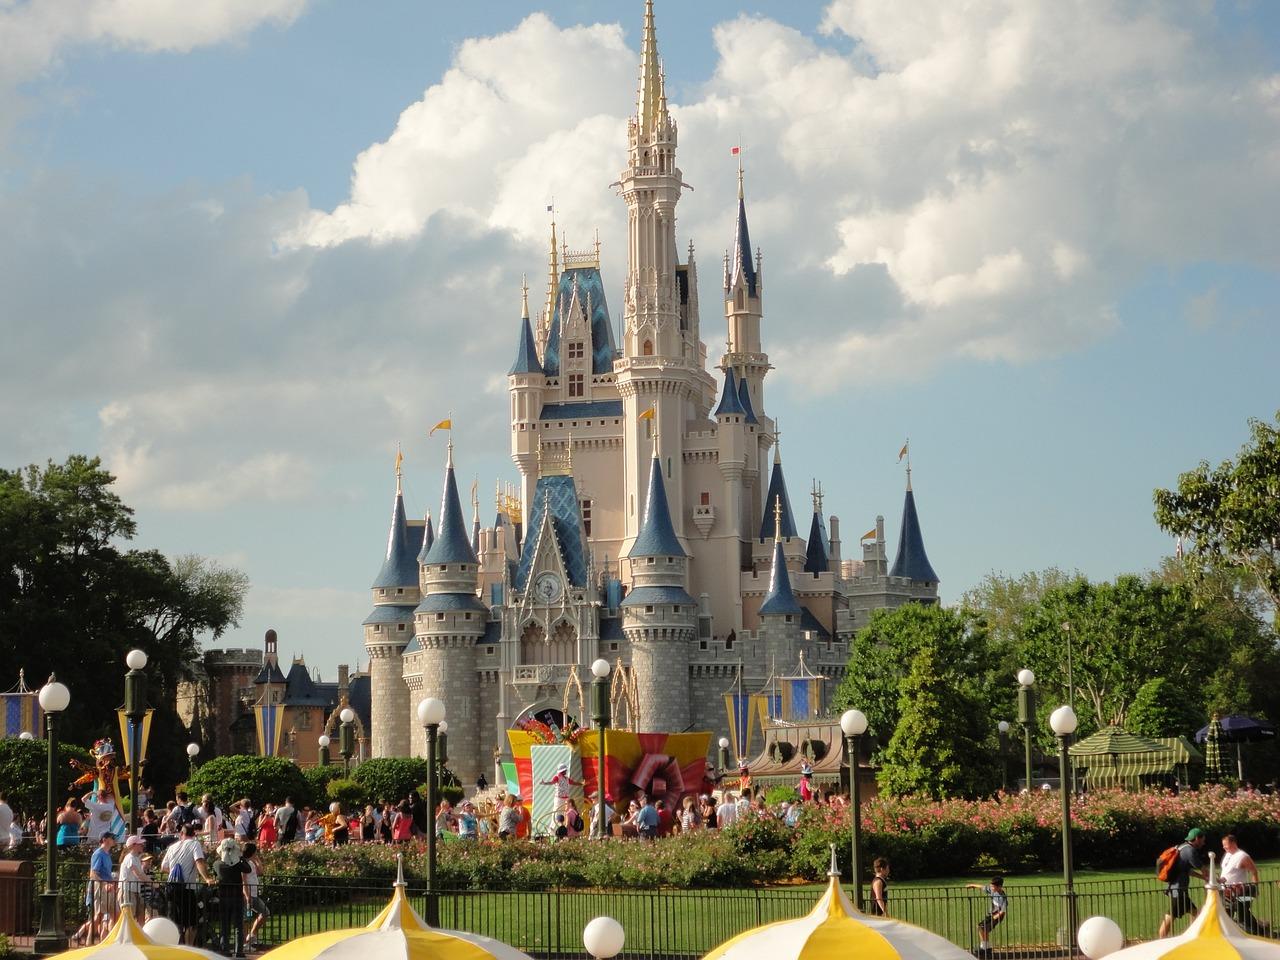 Welcome To Wdwnewscom! Home Of Everything Walt Disney - HD1200×900